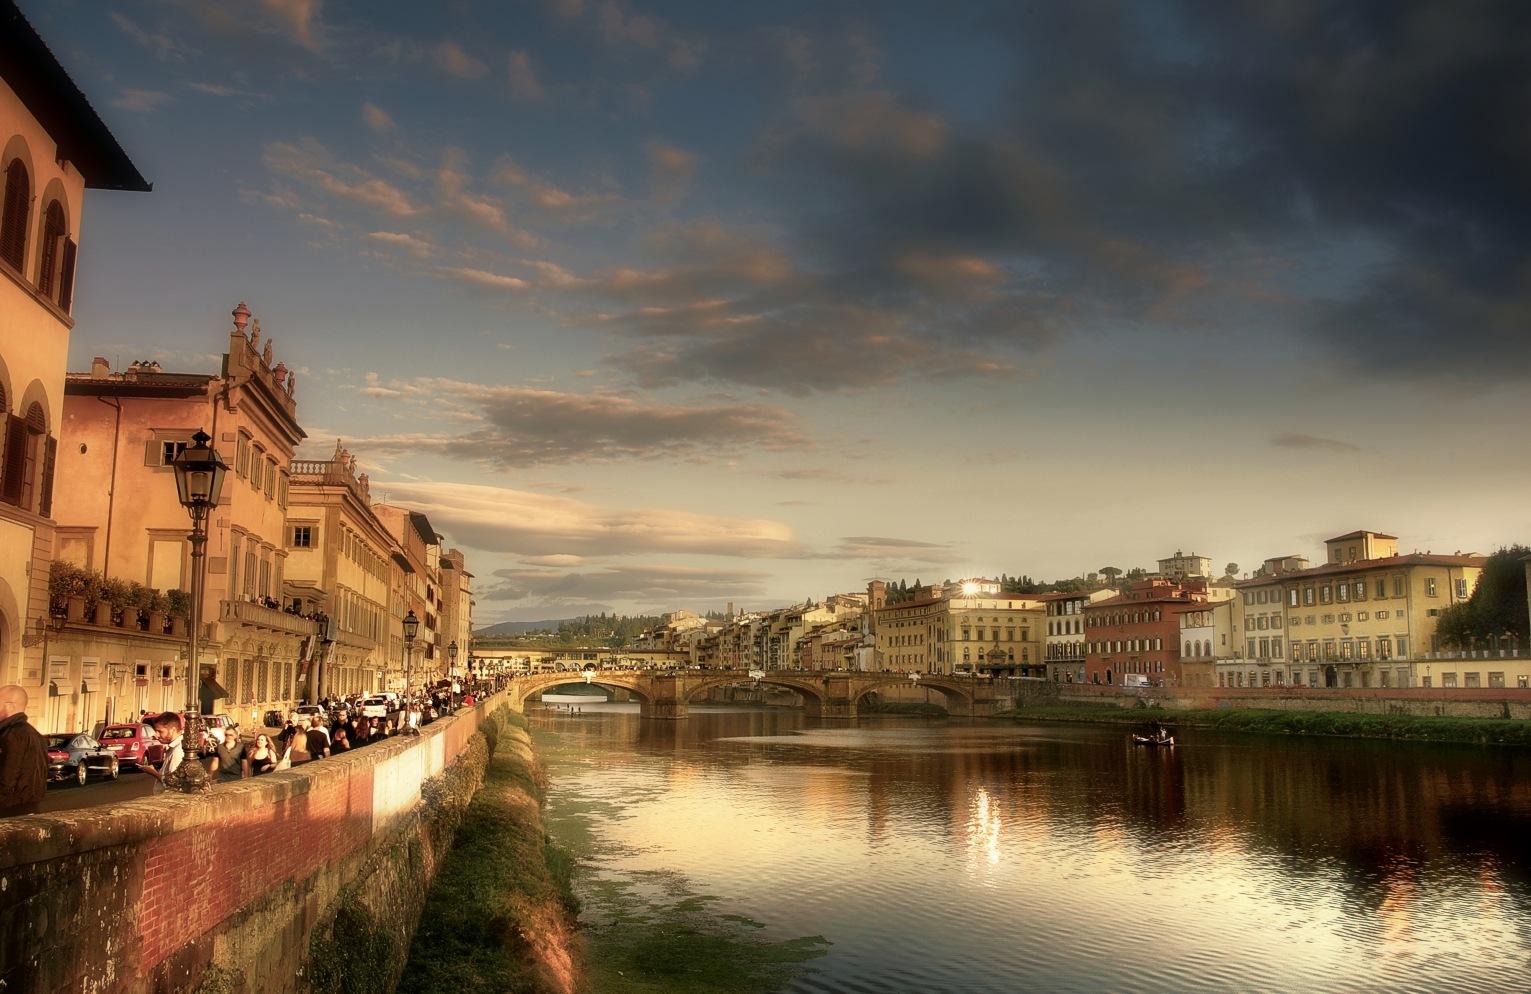 End of Afternoon in Firenze by Edu Vergara